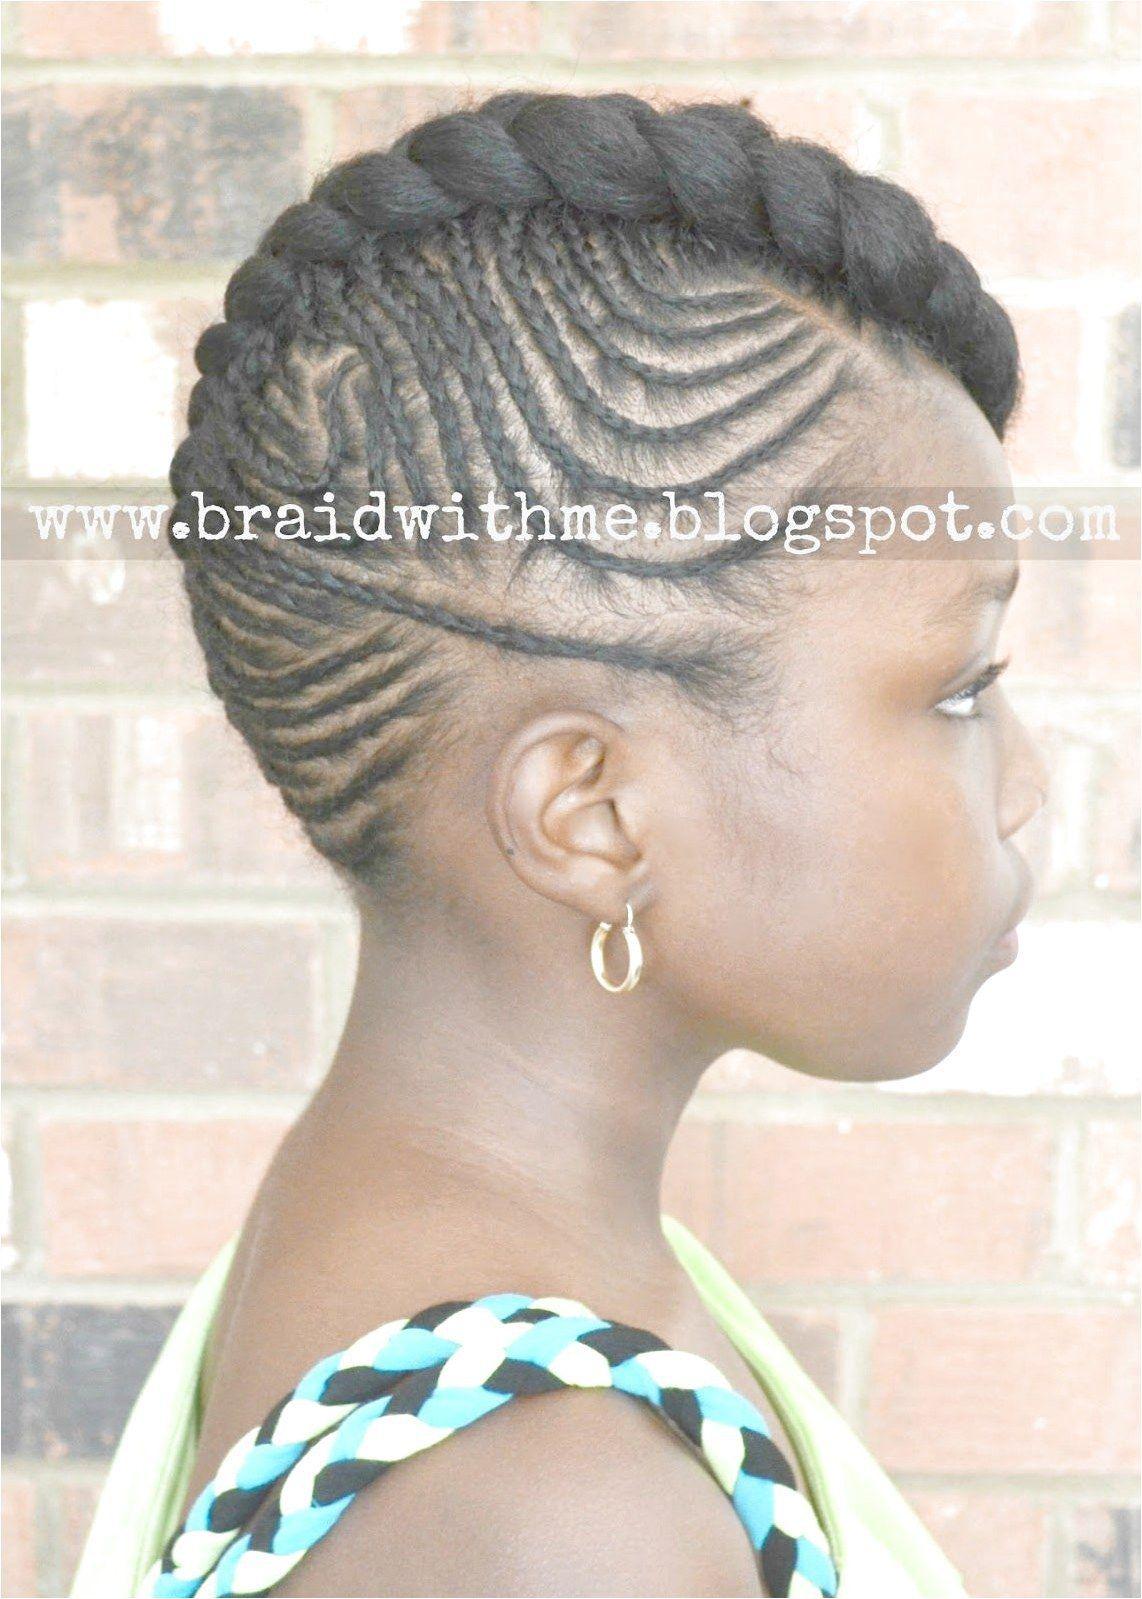 African Hair Braiding Cornrow Styles Mohawk Hairstyles Magazine Braidedhairstyles Cl Braided Hairstyles Cornrow Updo On Natural Hair Braided Hairstyles Updo